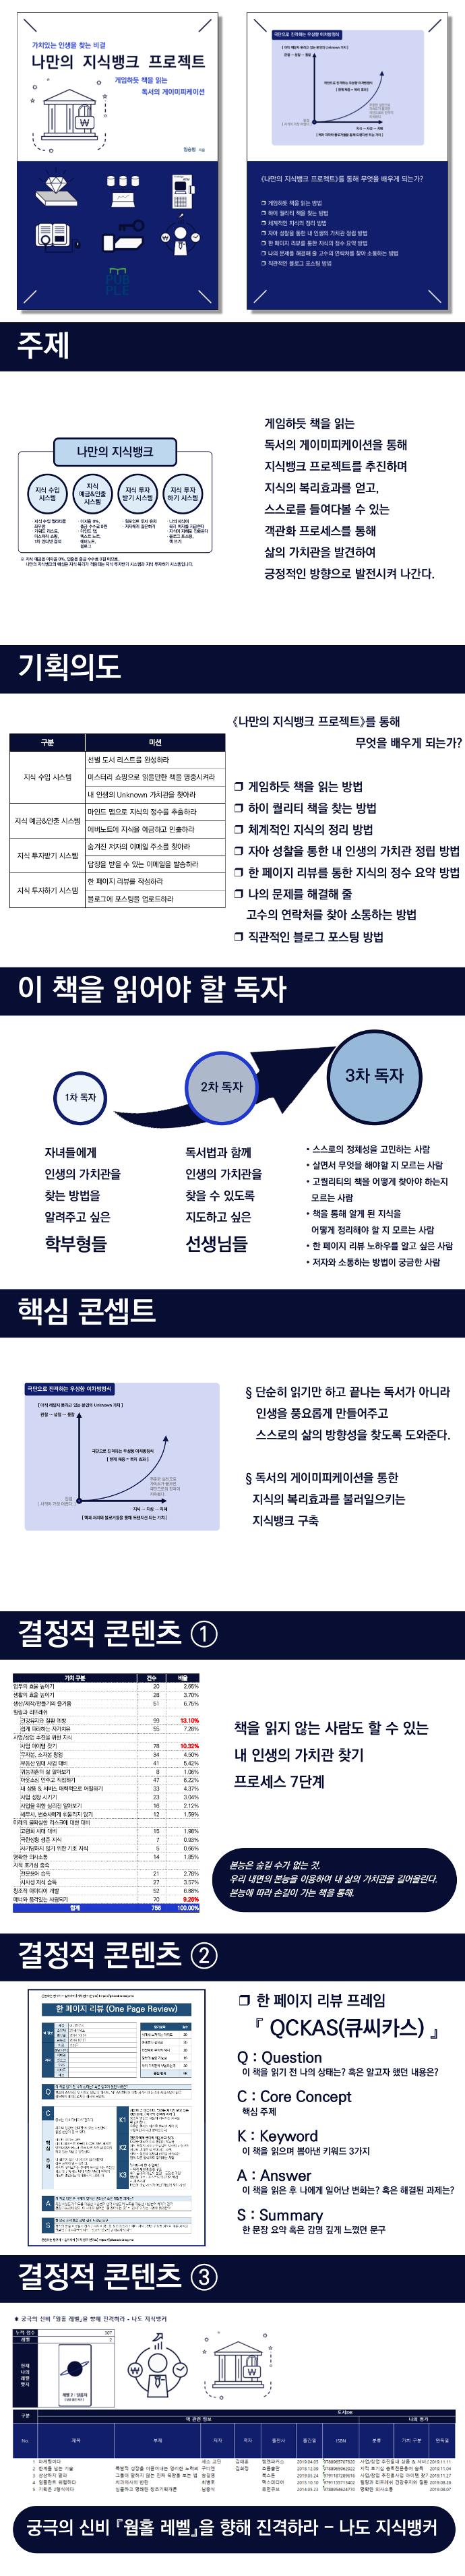 POD소개_나만의 지식뱅크 프로젝트_소개_690.png